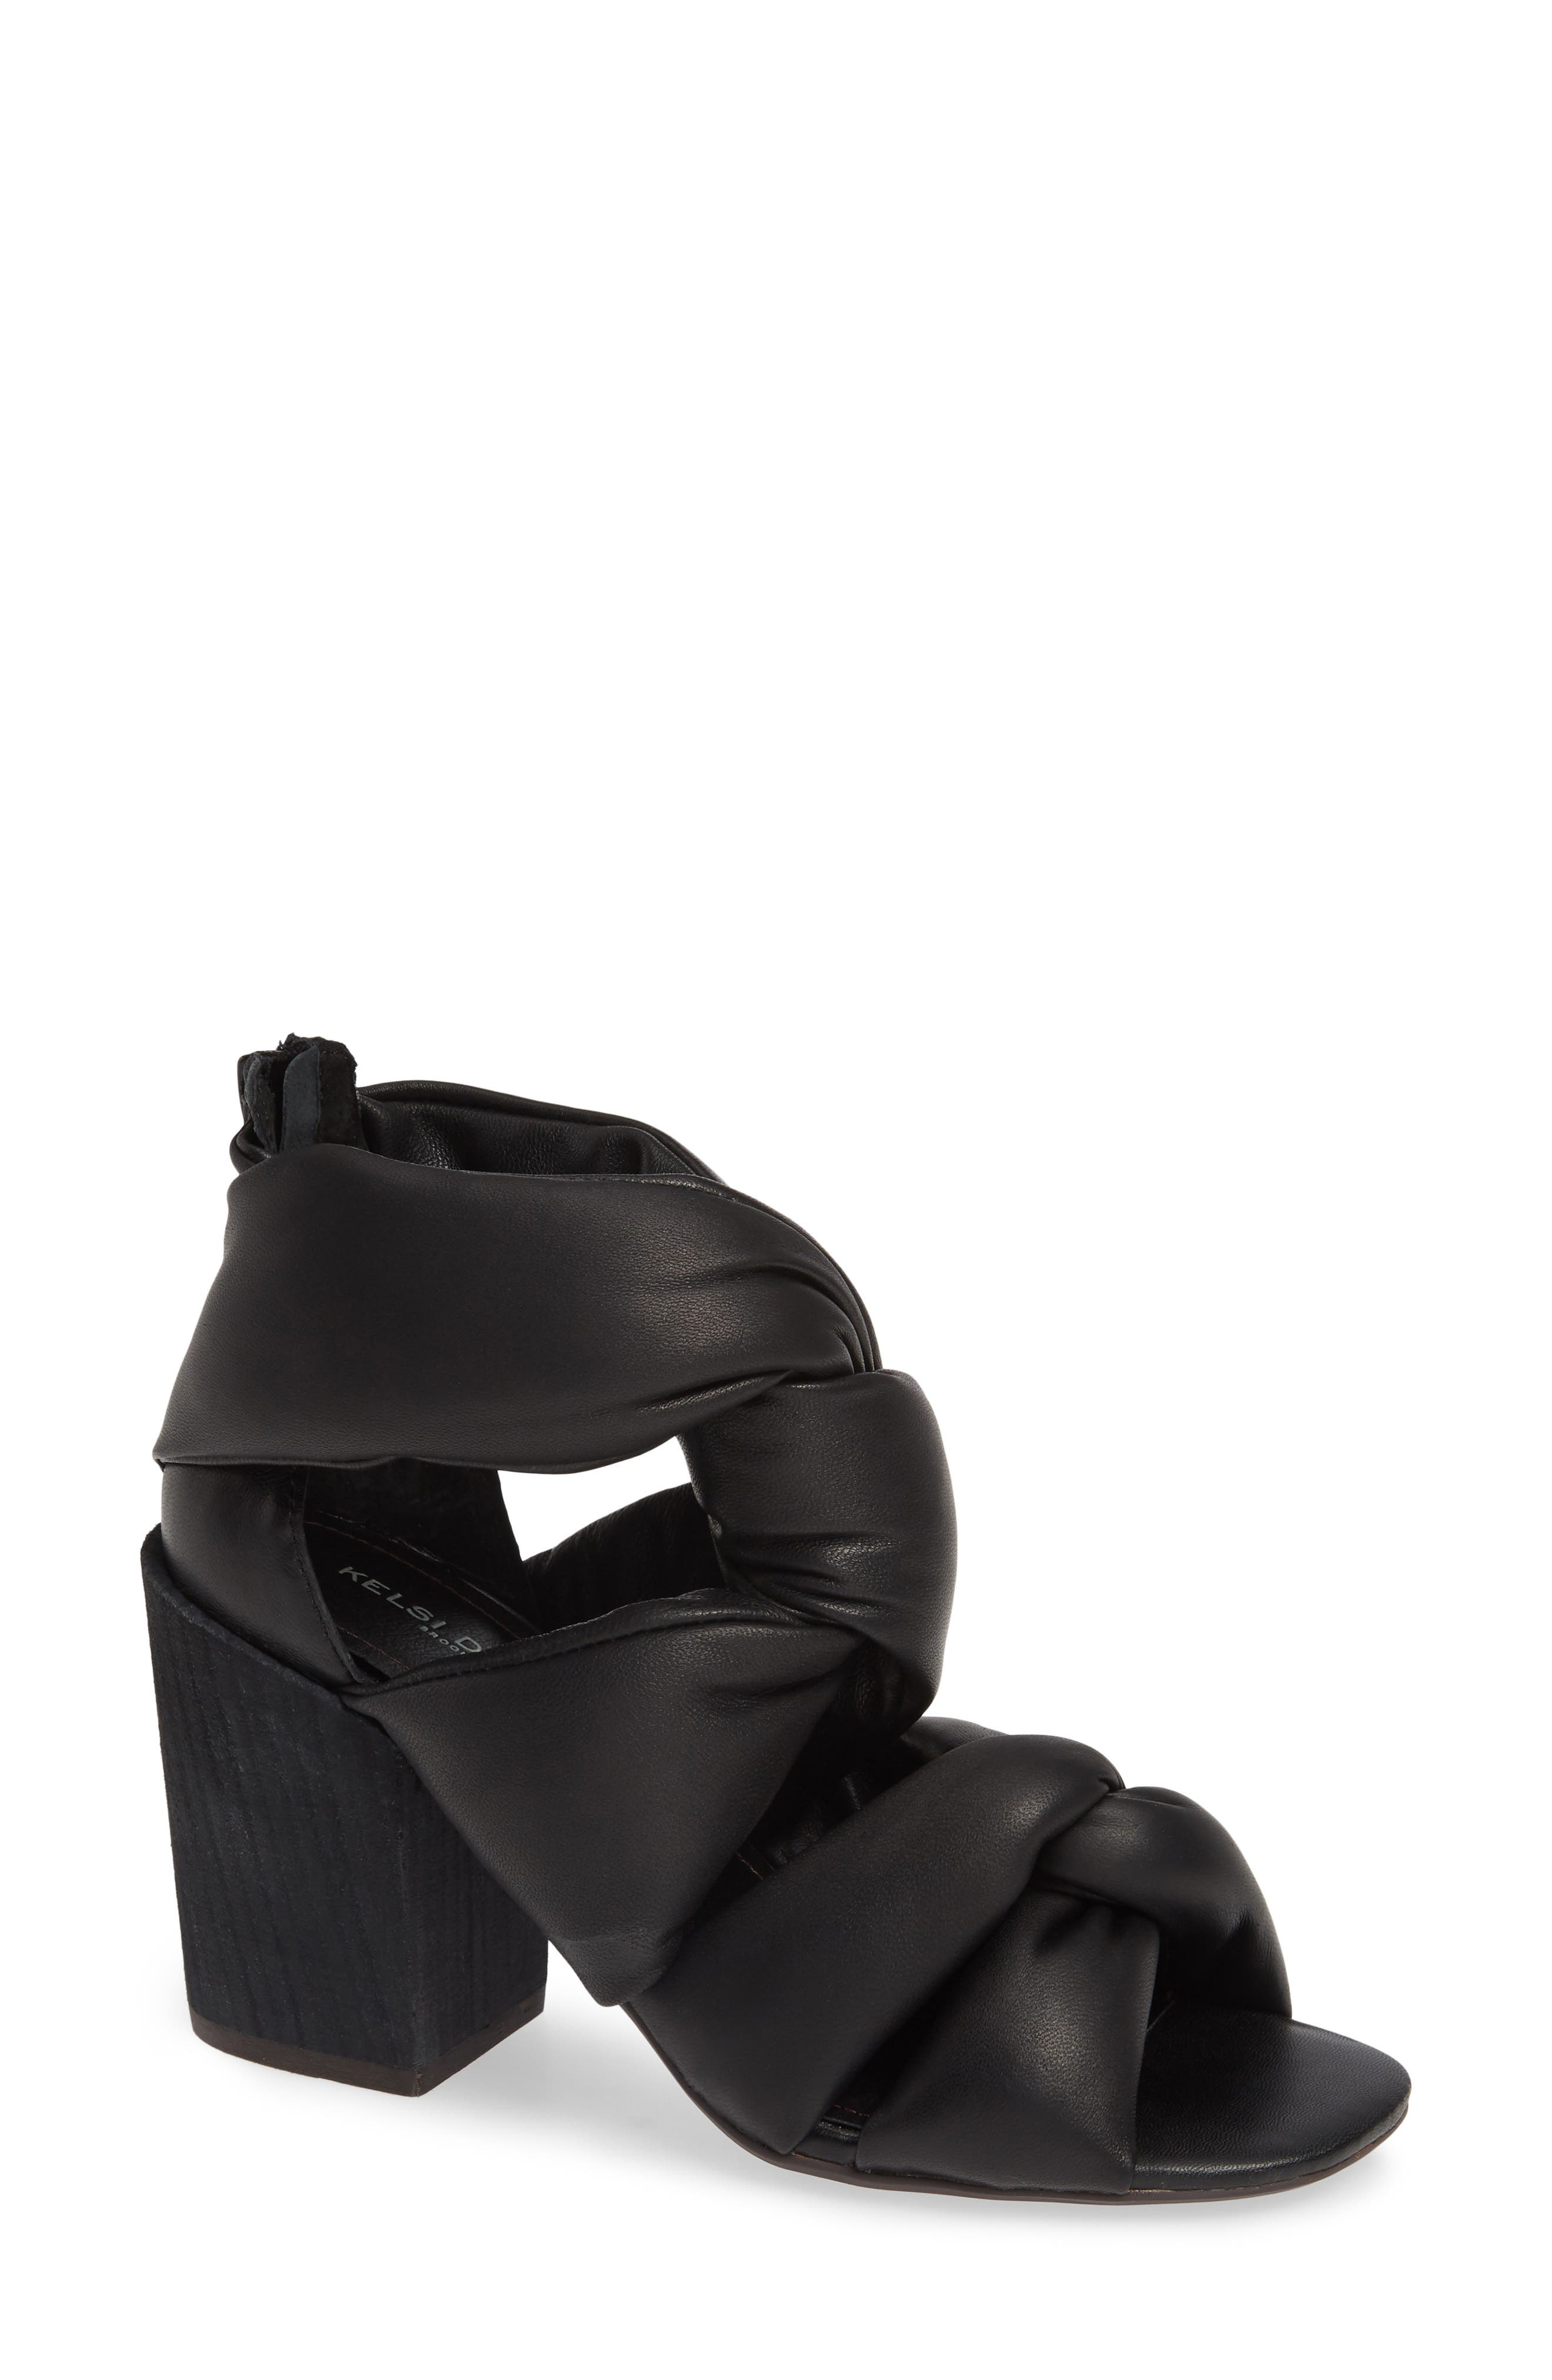 KELSI DAGGER BROOKLYN Maddox Knotted Strap Sandal, Main, color, BLACK